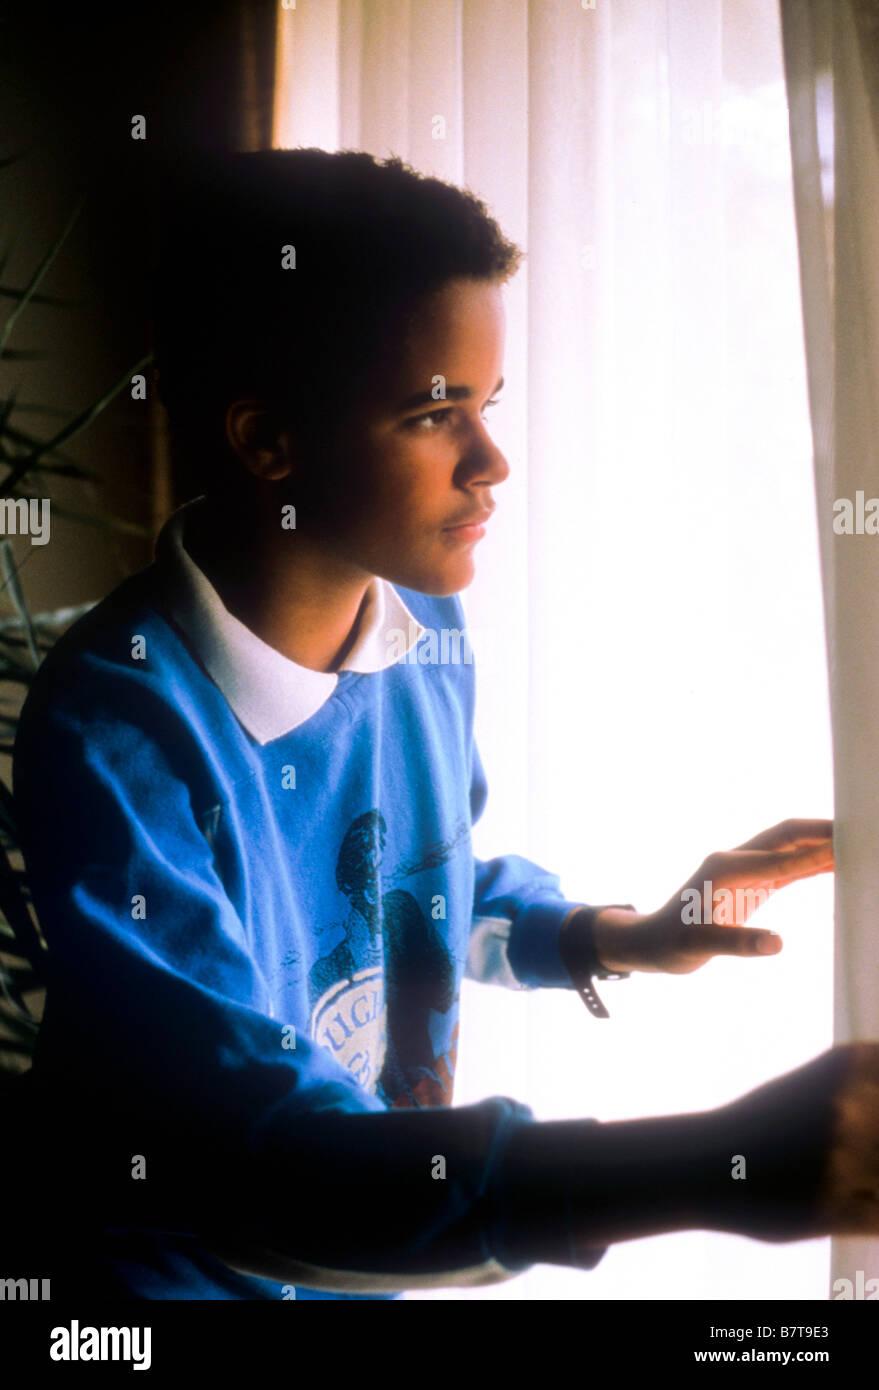 Black Teen Boy Looks Sad And Worried As He Looks Out Window Stock Photo Alamy